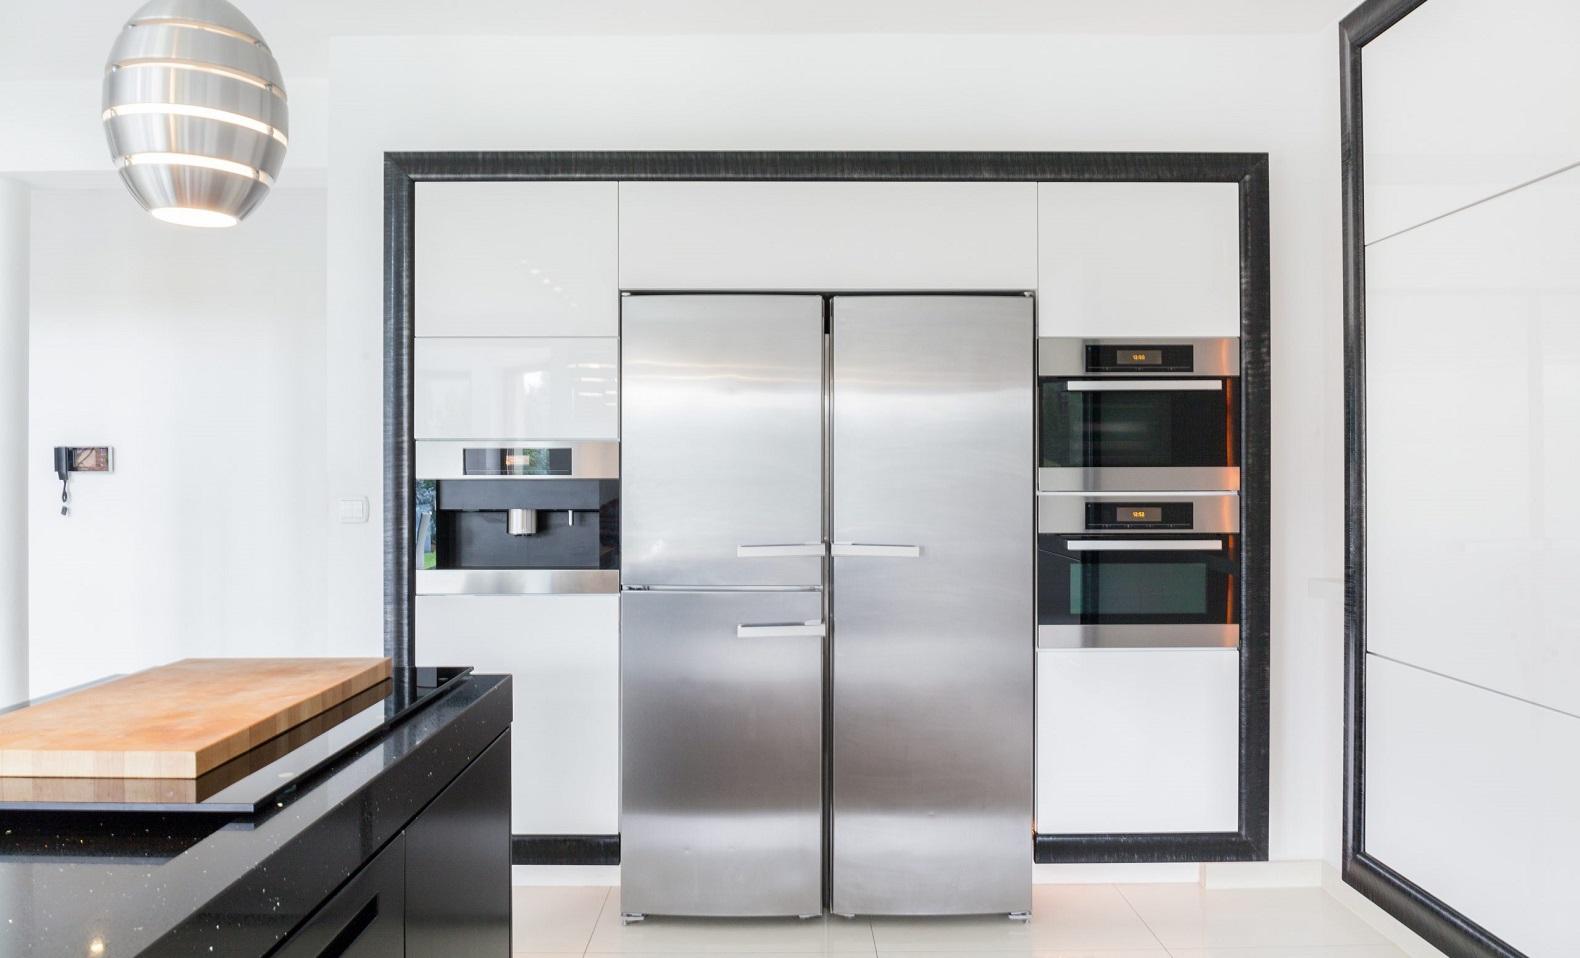 frigorifero da incasso o libero consigli cucina